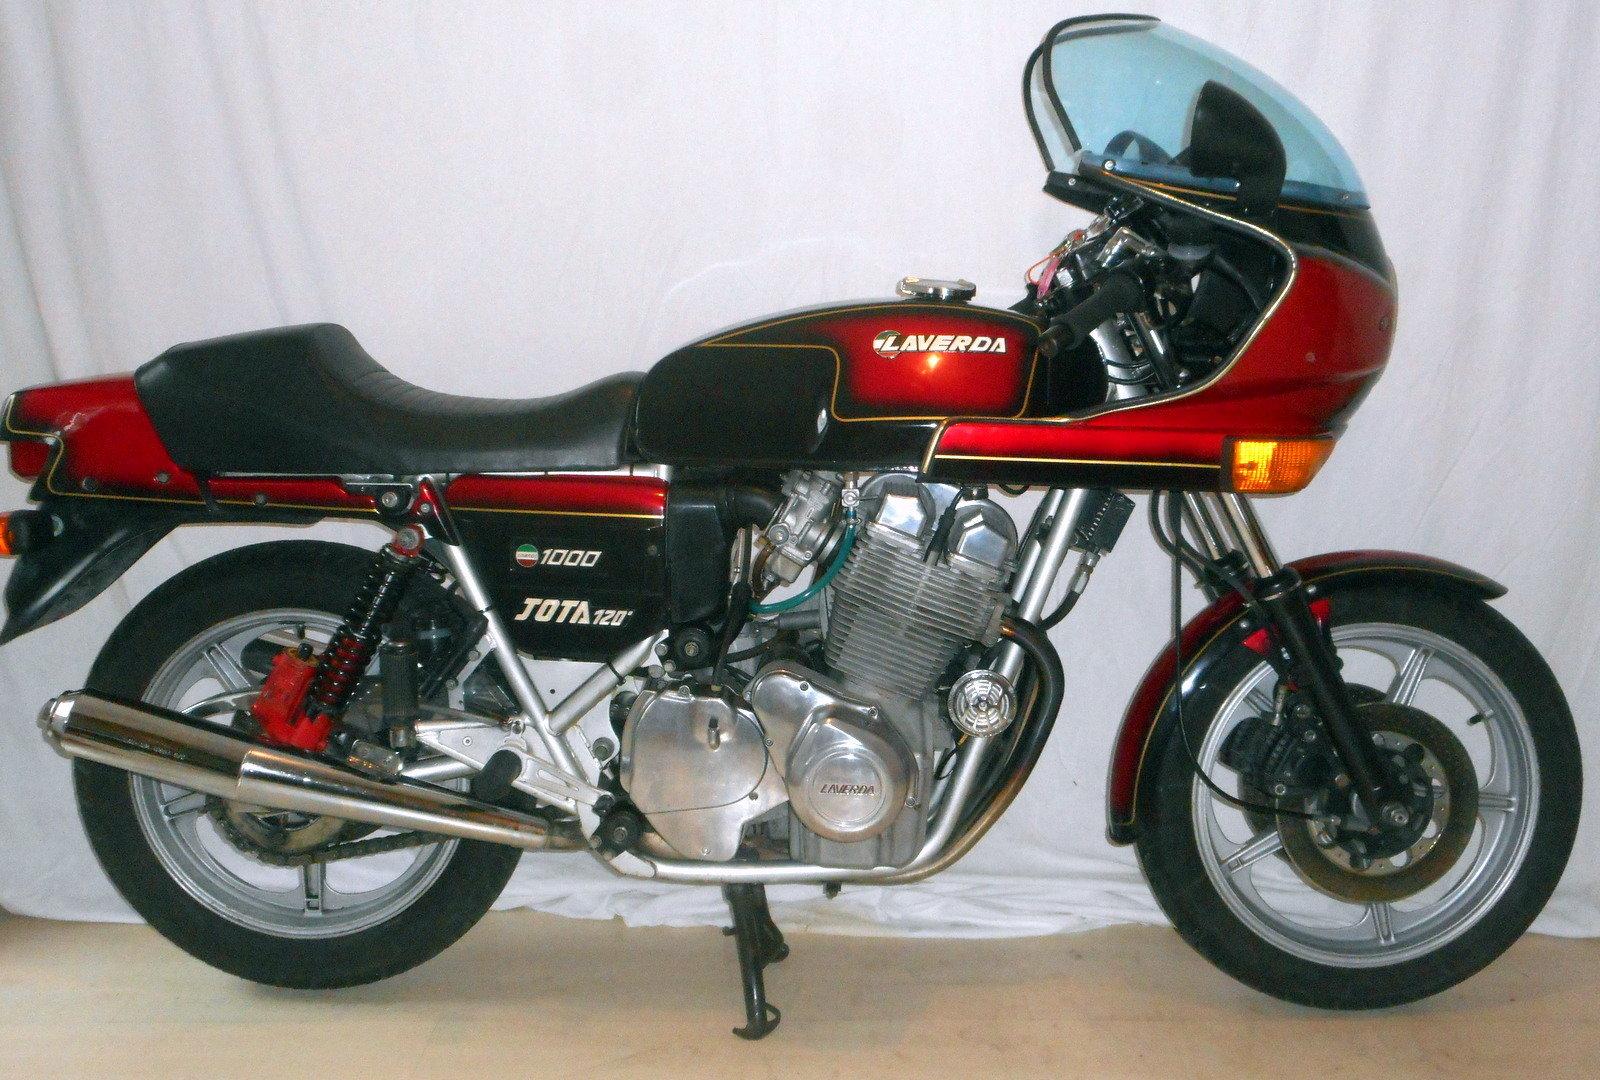 1982 Laverda jota 120 original For Sale (picture 3 of 4)